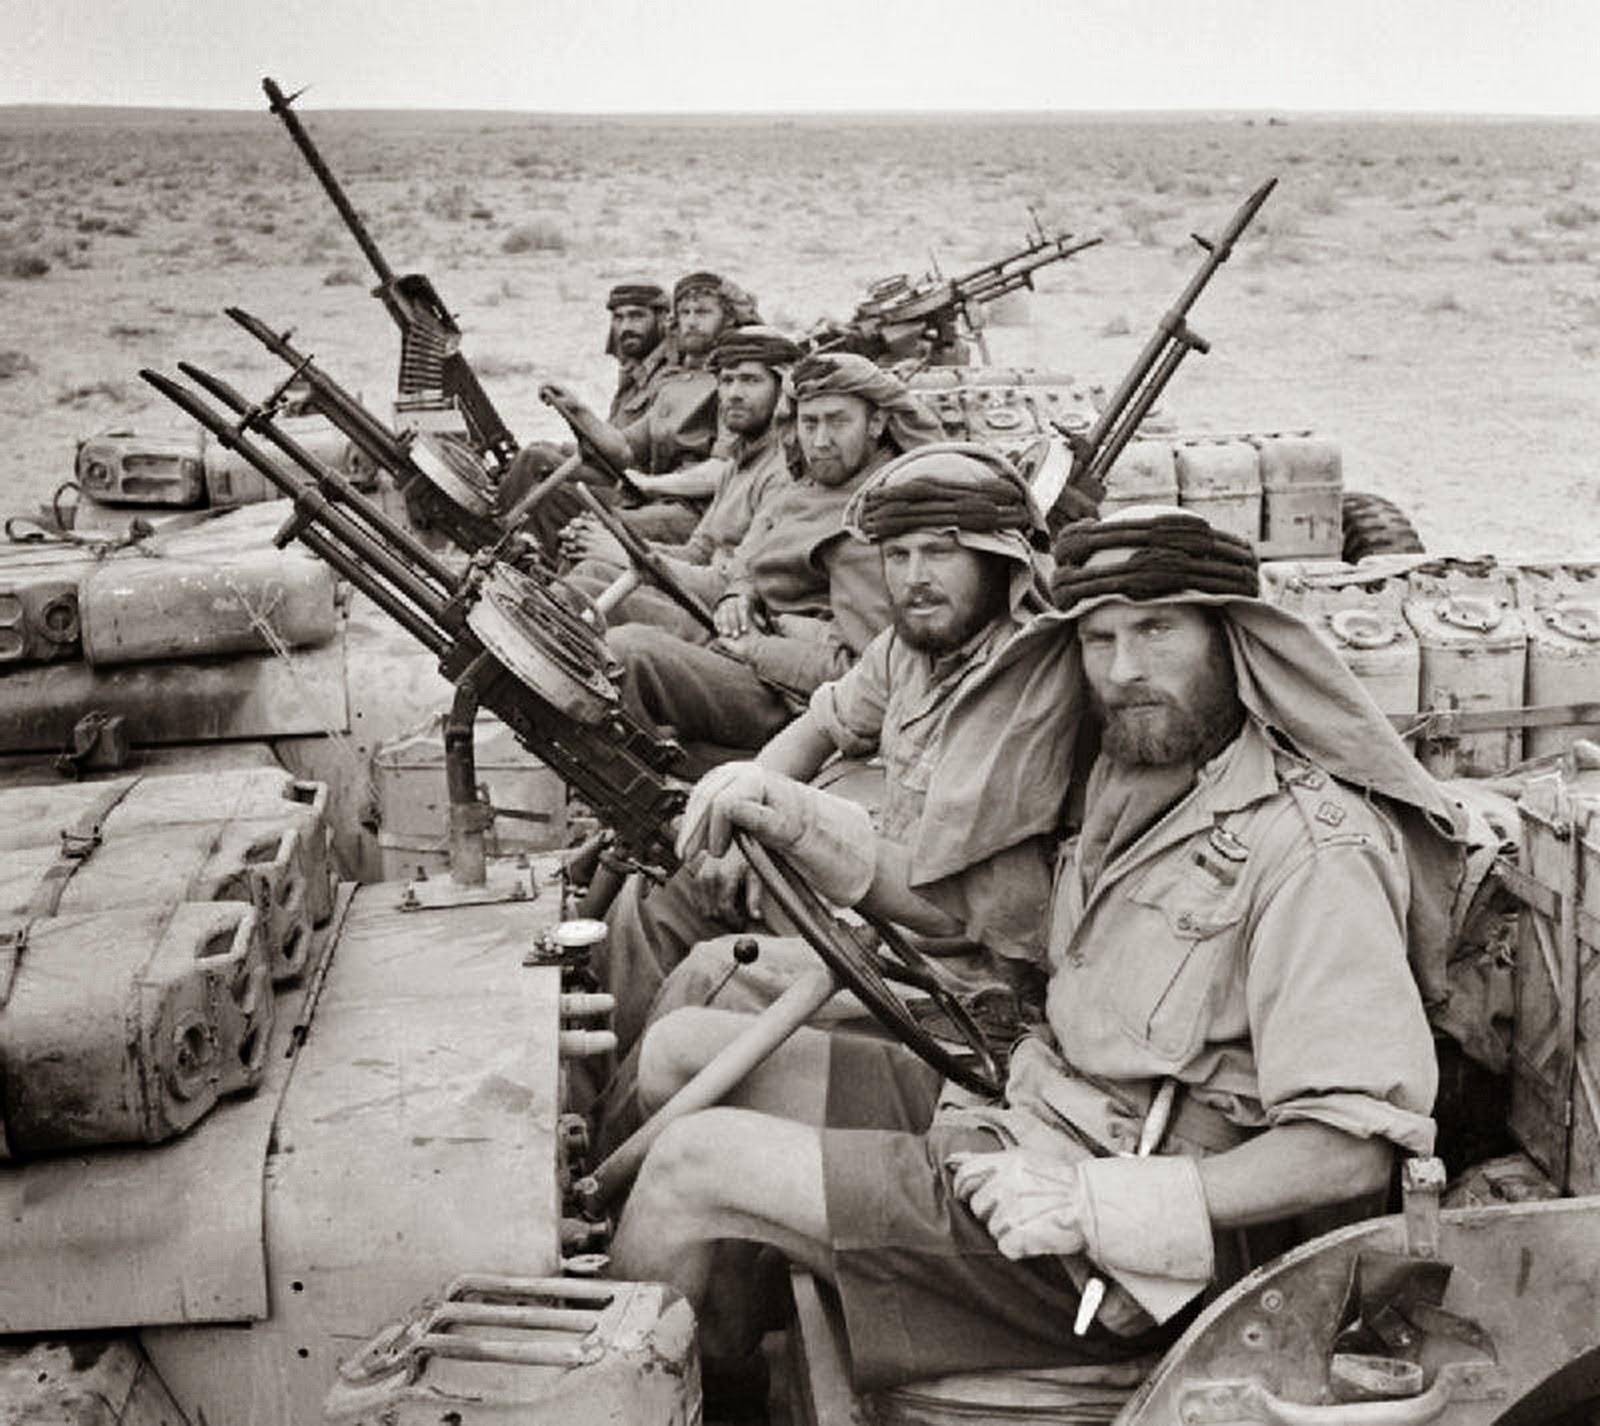 http://www.arrse.co.uk/community/attachments/sas-beards-jeep-long-range-desert-group-africa-vehicle-kafiyeh-arab-jpg.159303/